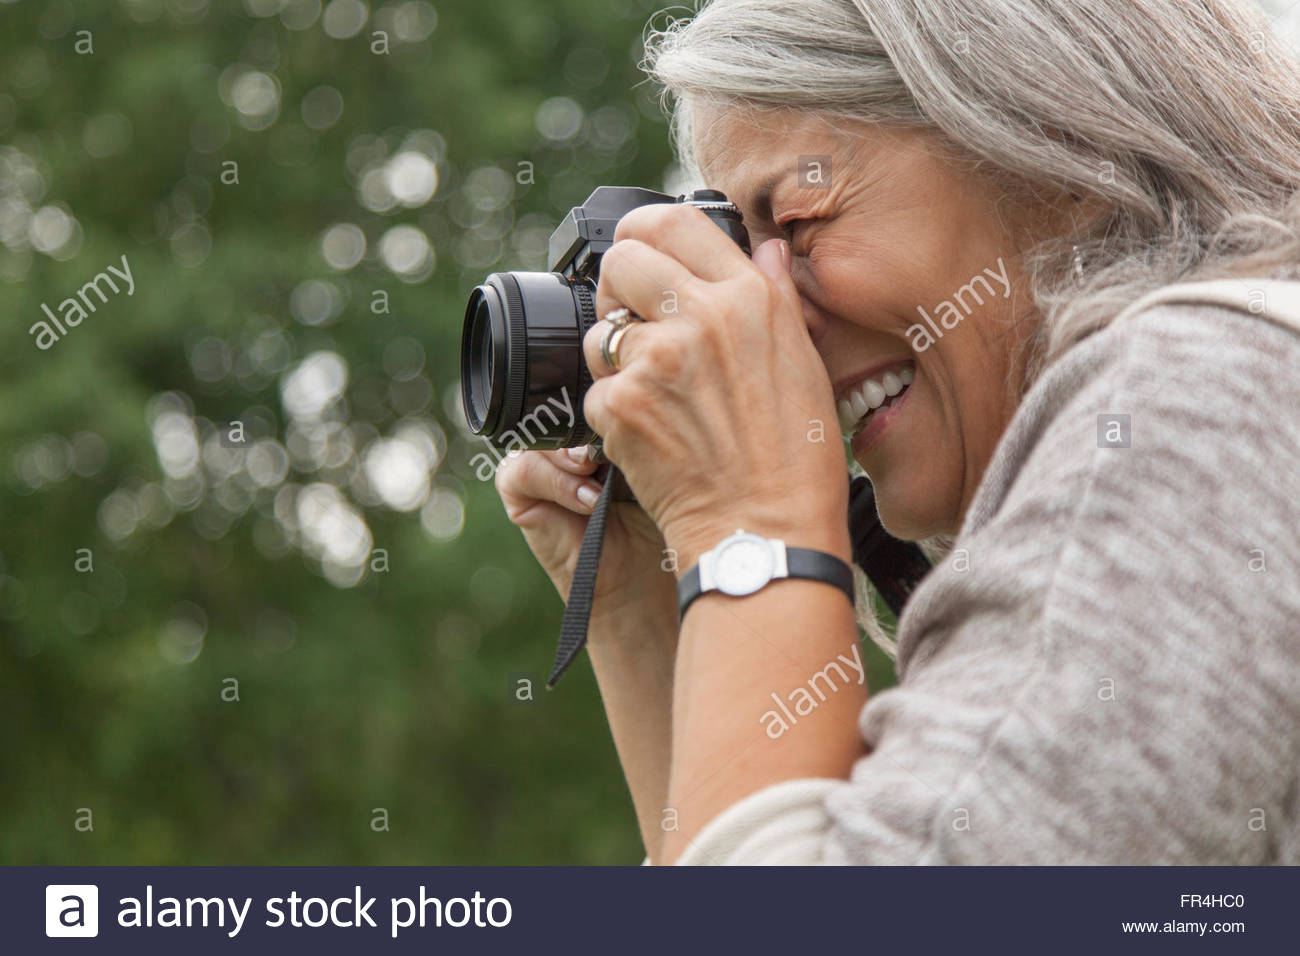 Senior woman taking pictures outdoors Photo Stock